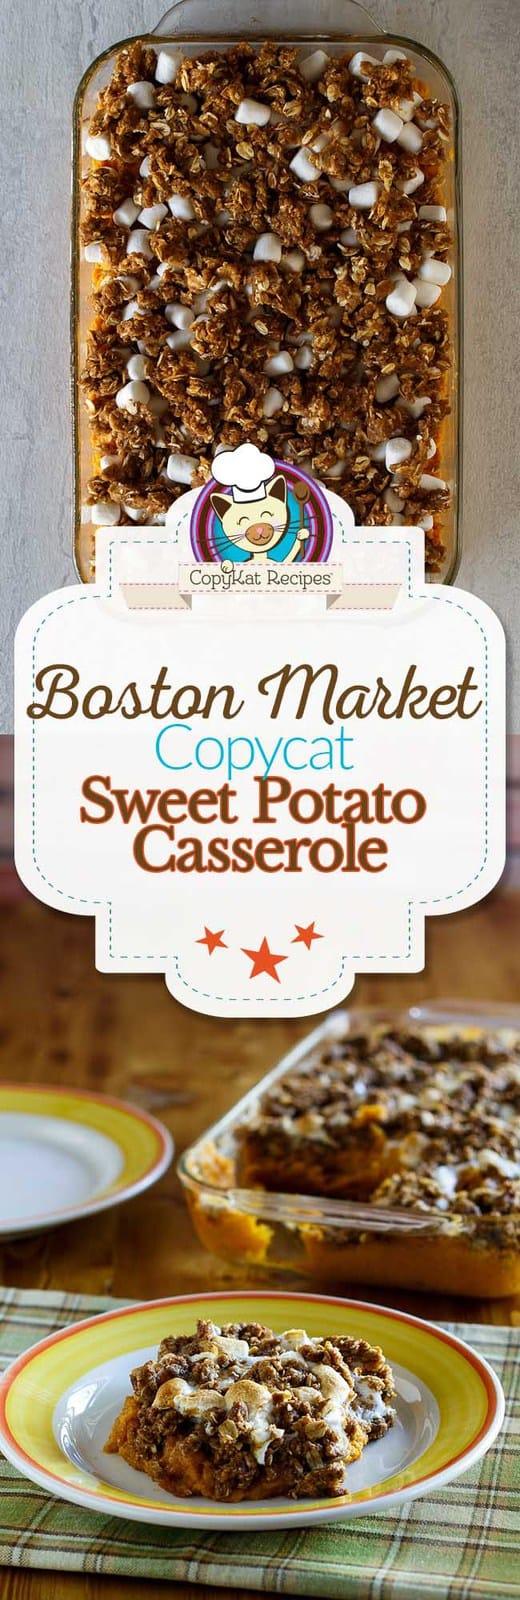 Boston Market Sweet Potato Casserole